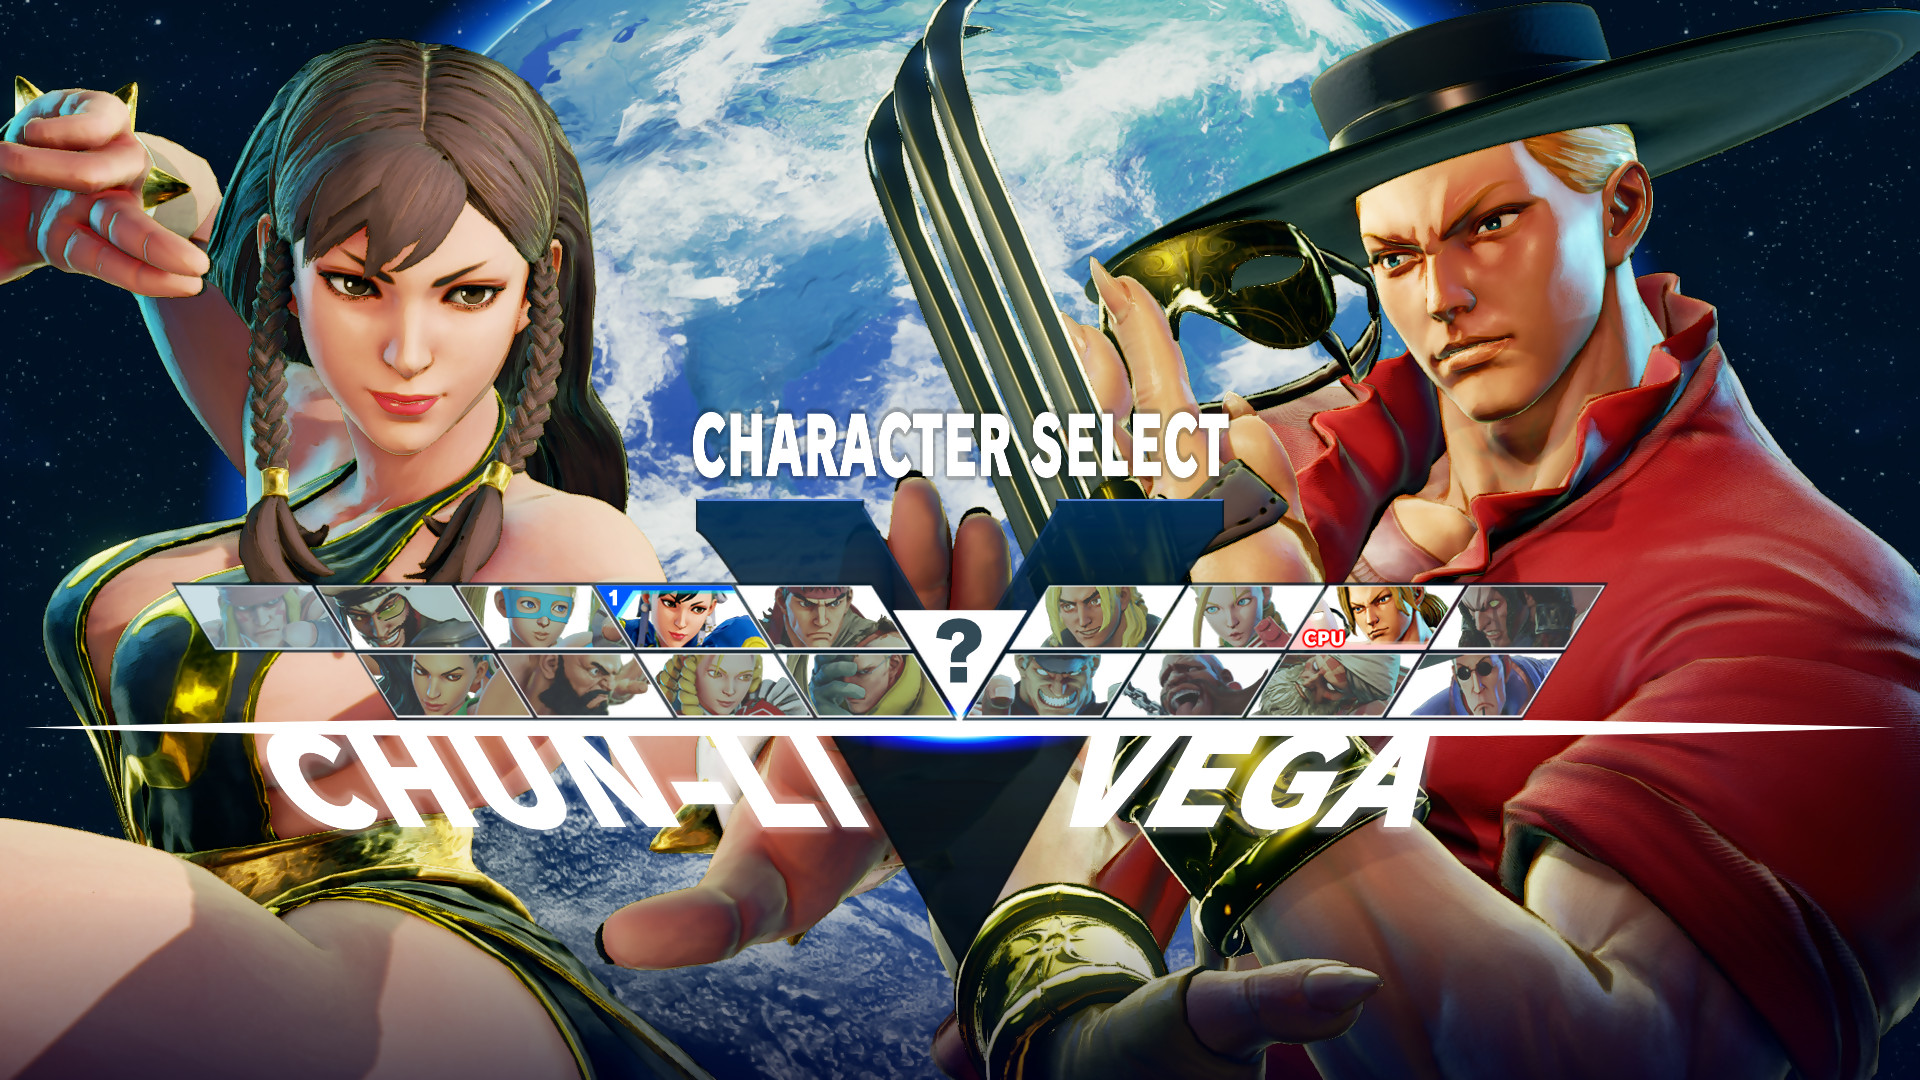 Le Messie revient ! Street Fighter V est annoncé  - Page 25 Street-fighter-5-56fae963b144a